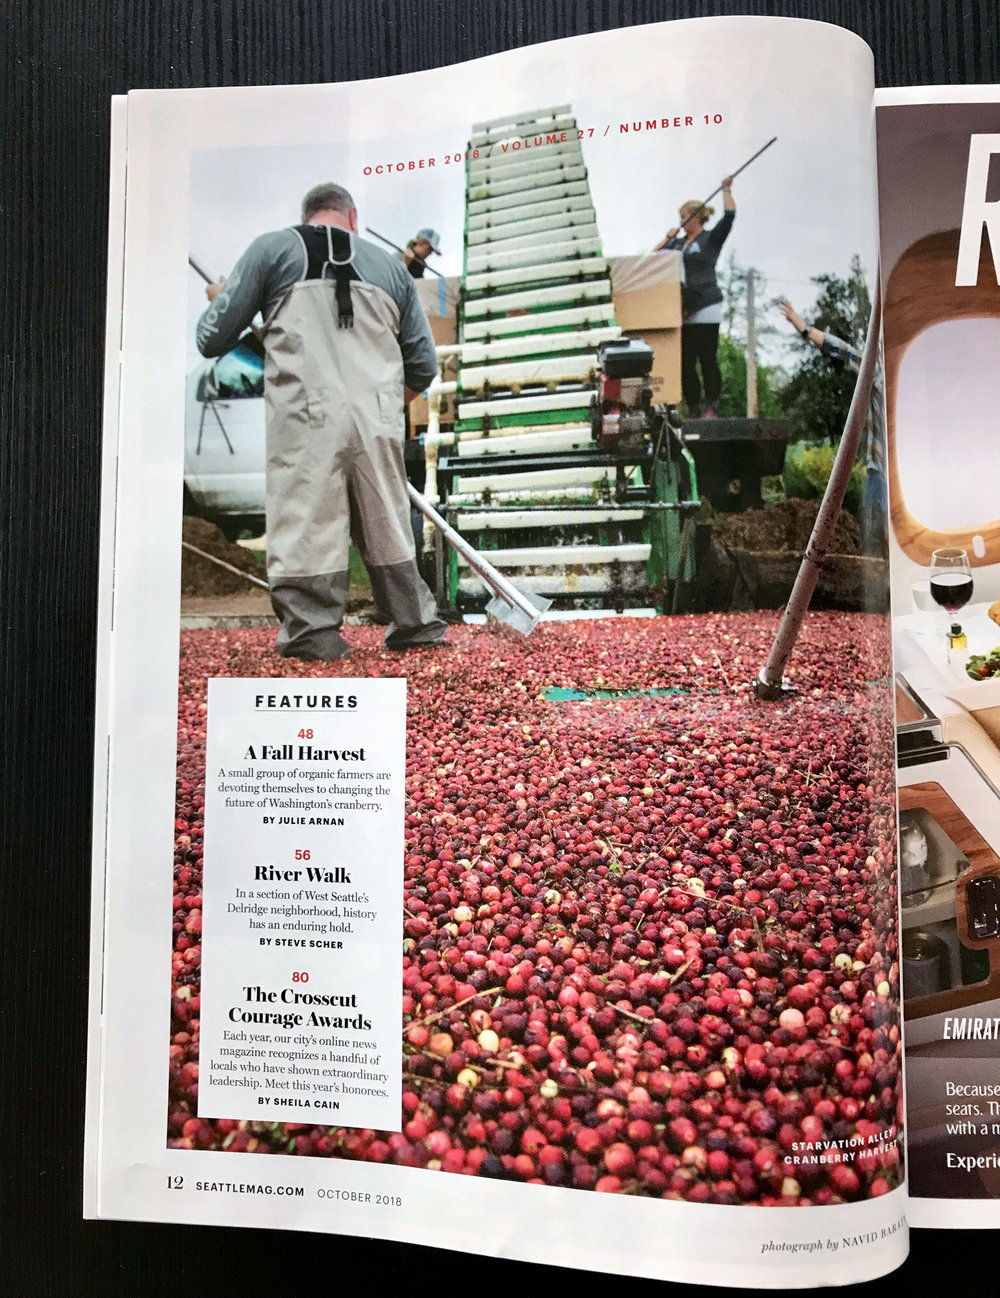 cranberries-5.jpg